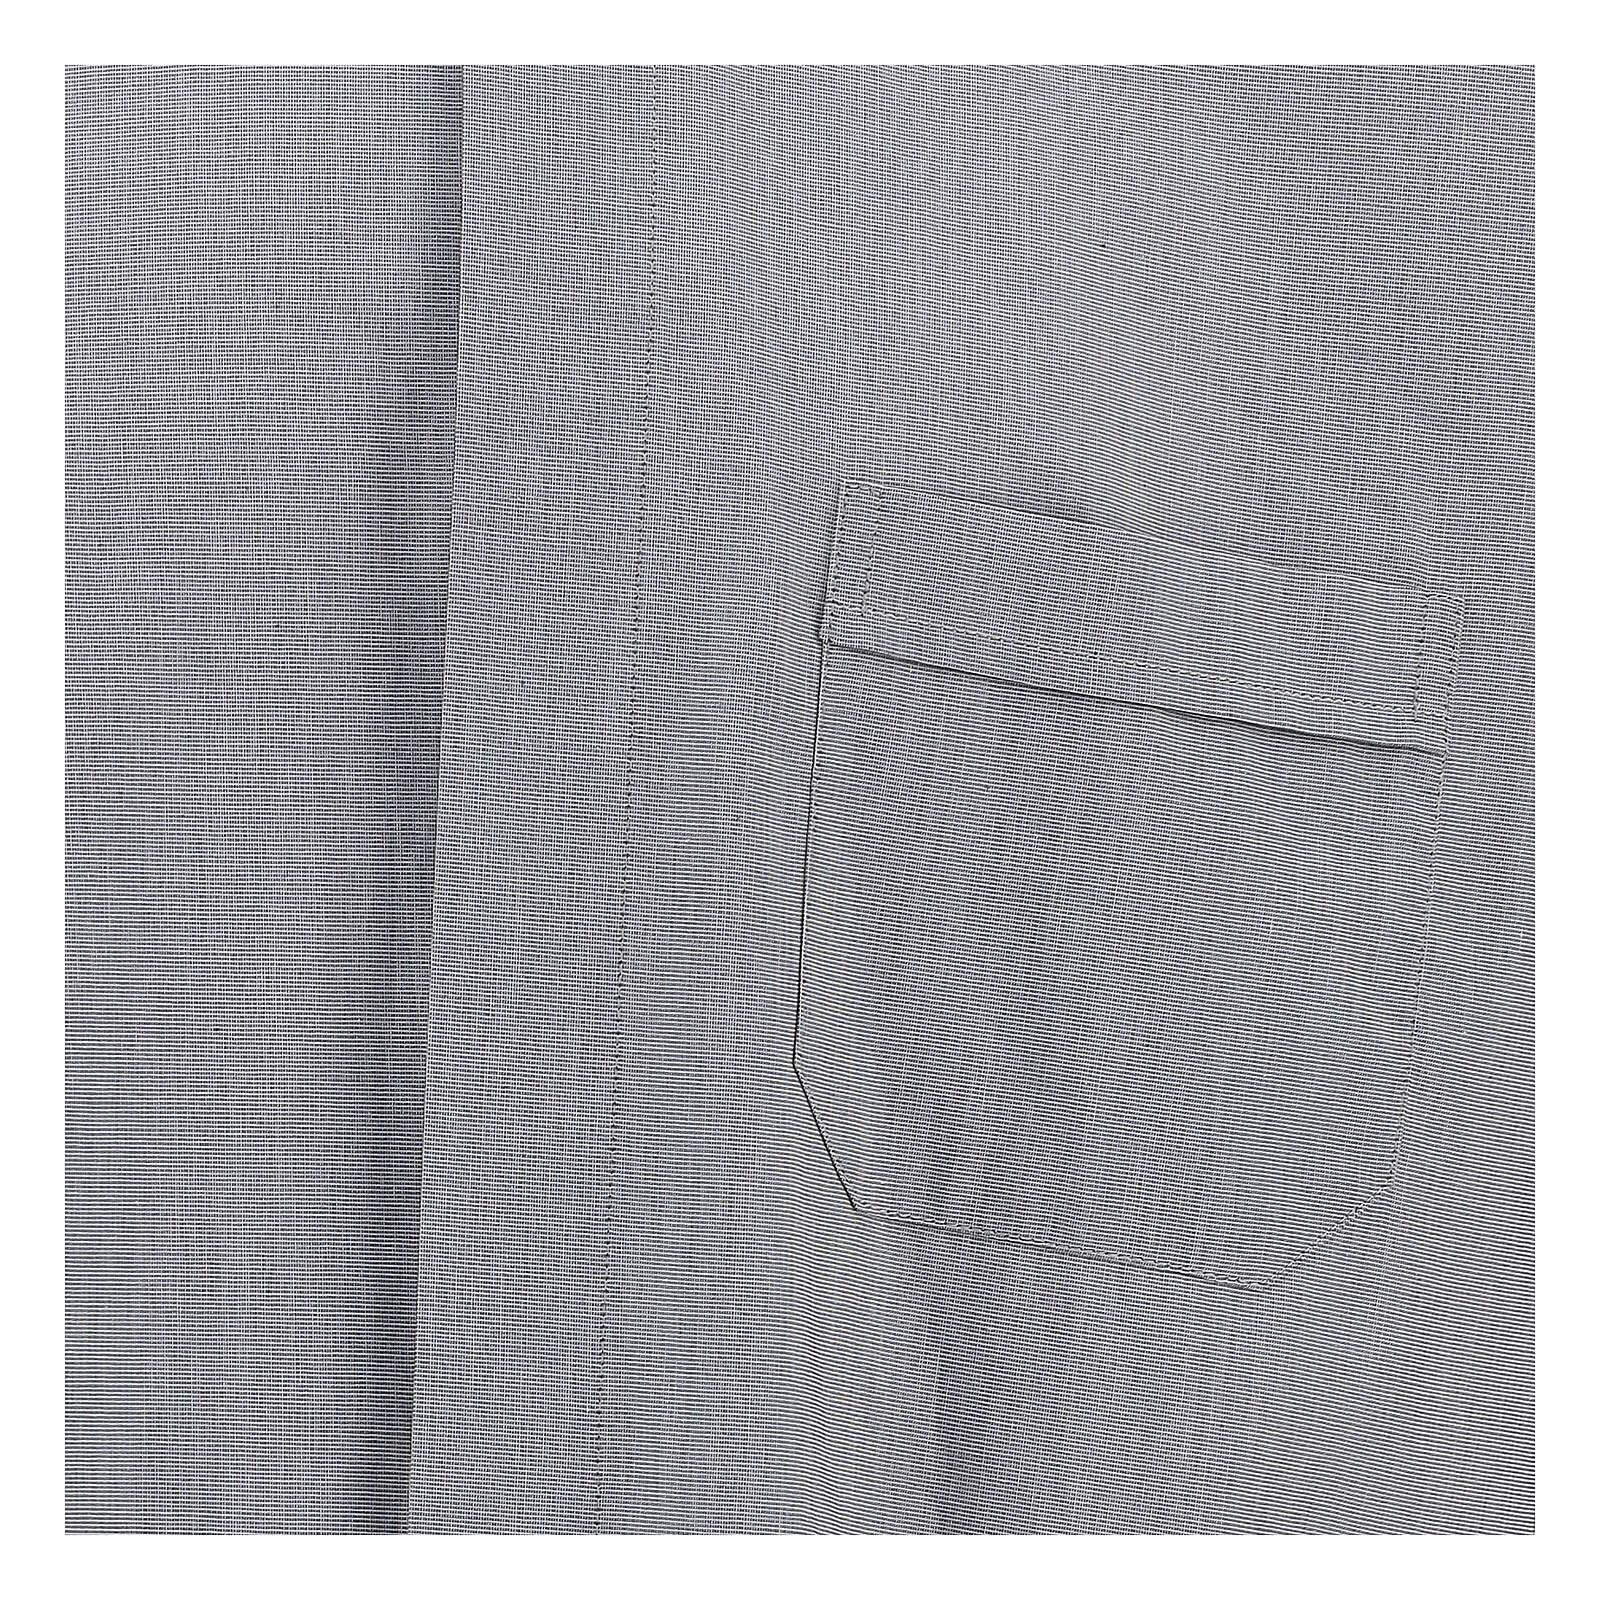 Camisa colarinho clergy filafil cinzento claro manga longa 4